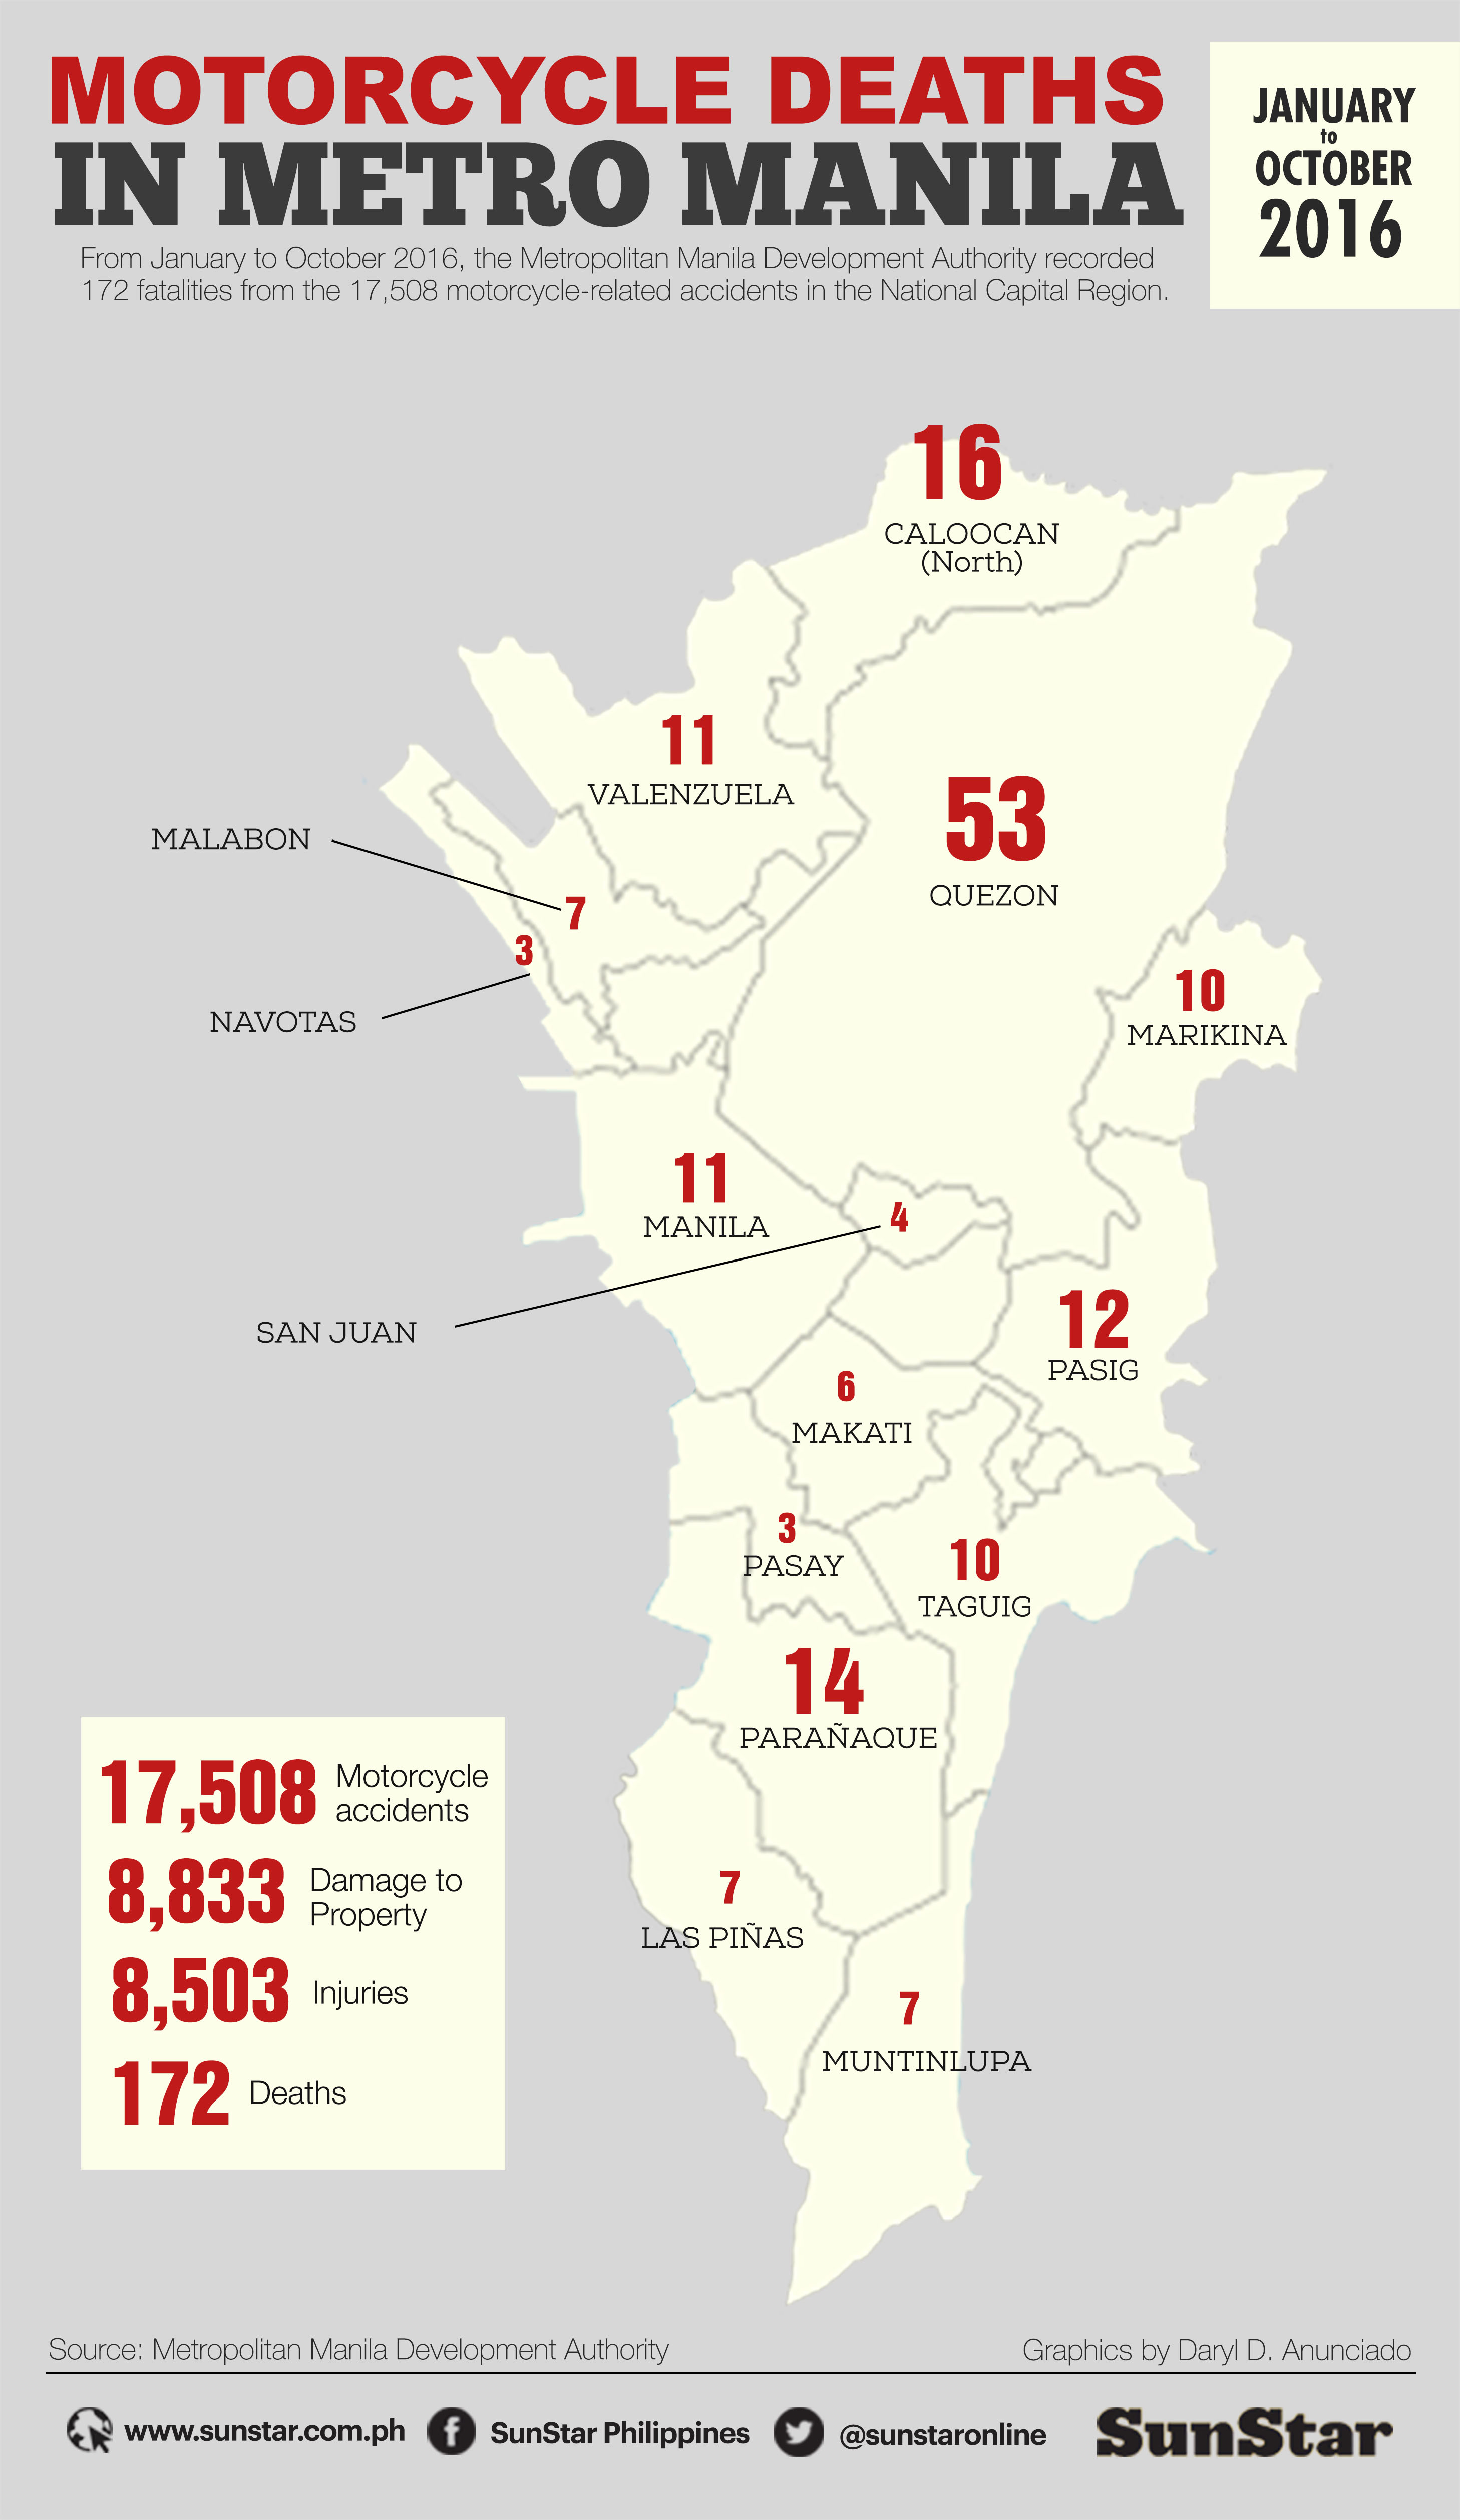 Motorcycle deaths in Metro Manila Jan-Oct 2016